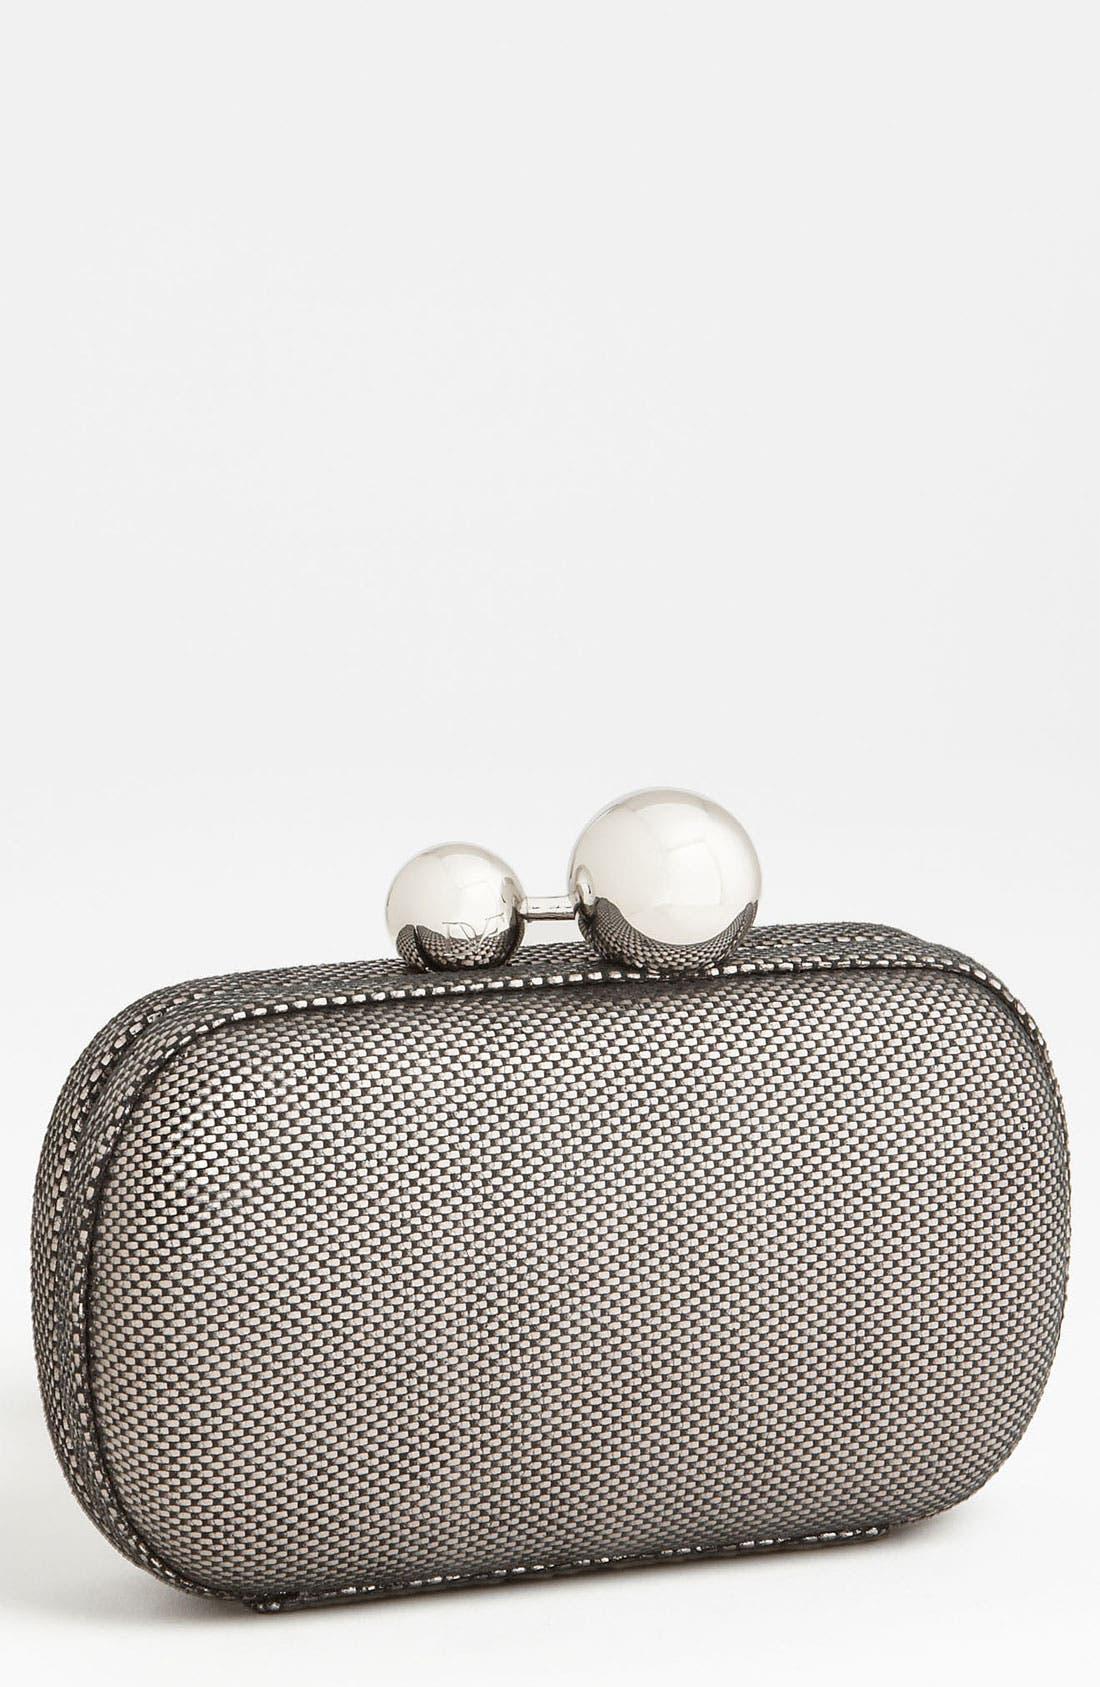 Alternate Image 1 Selected - Diane von Furstenberg Metallic Tweed Leather Minaudiere